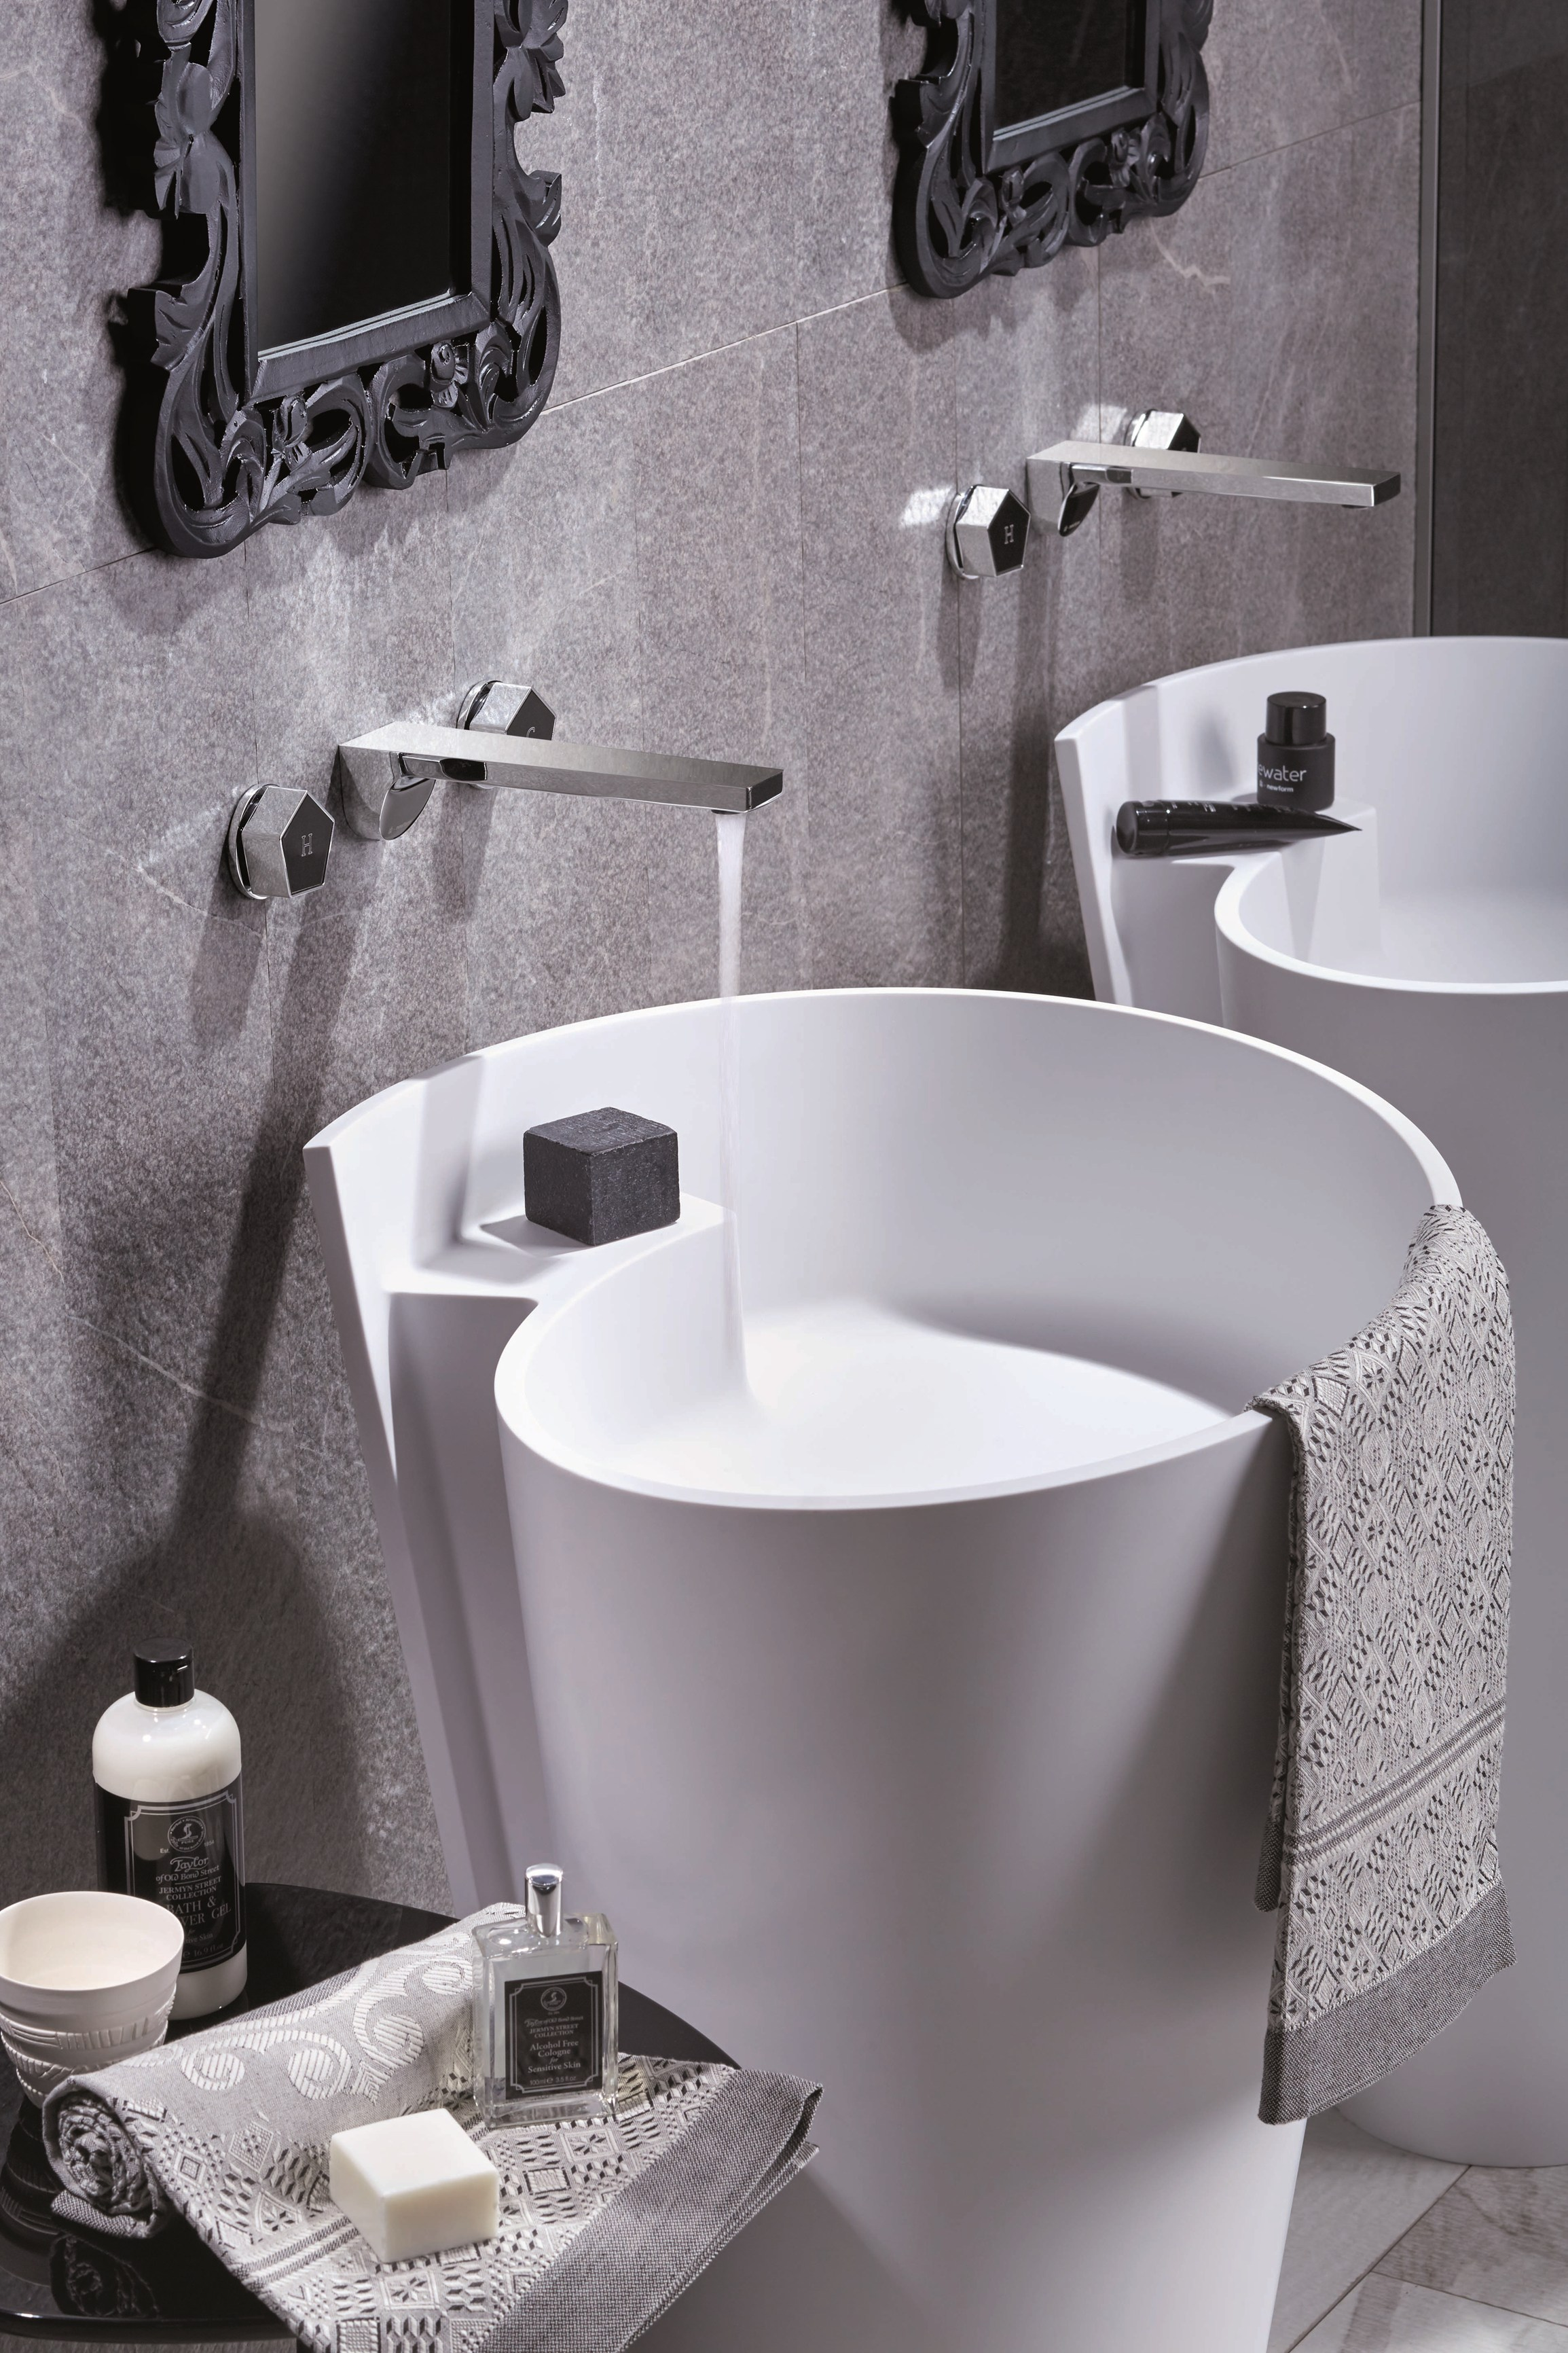 prodotti newform | archiproducts - Ceramica Bagno Fluida Di Newform